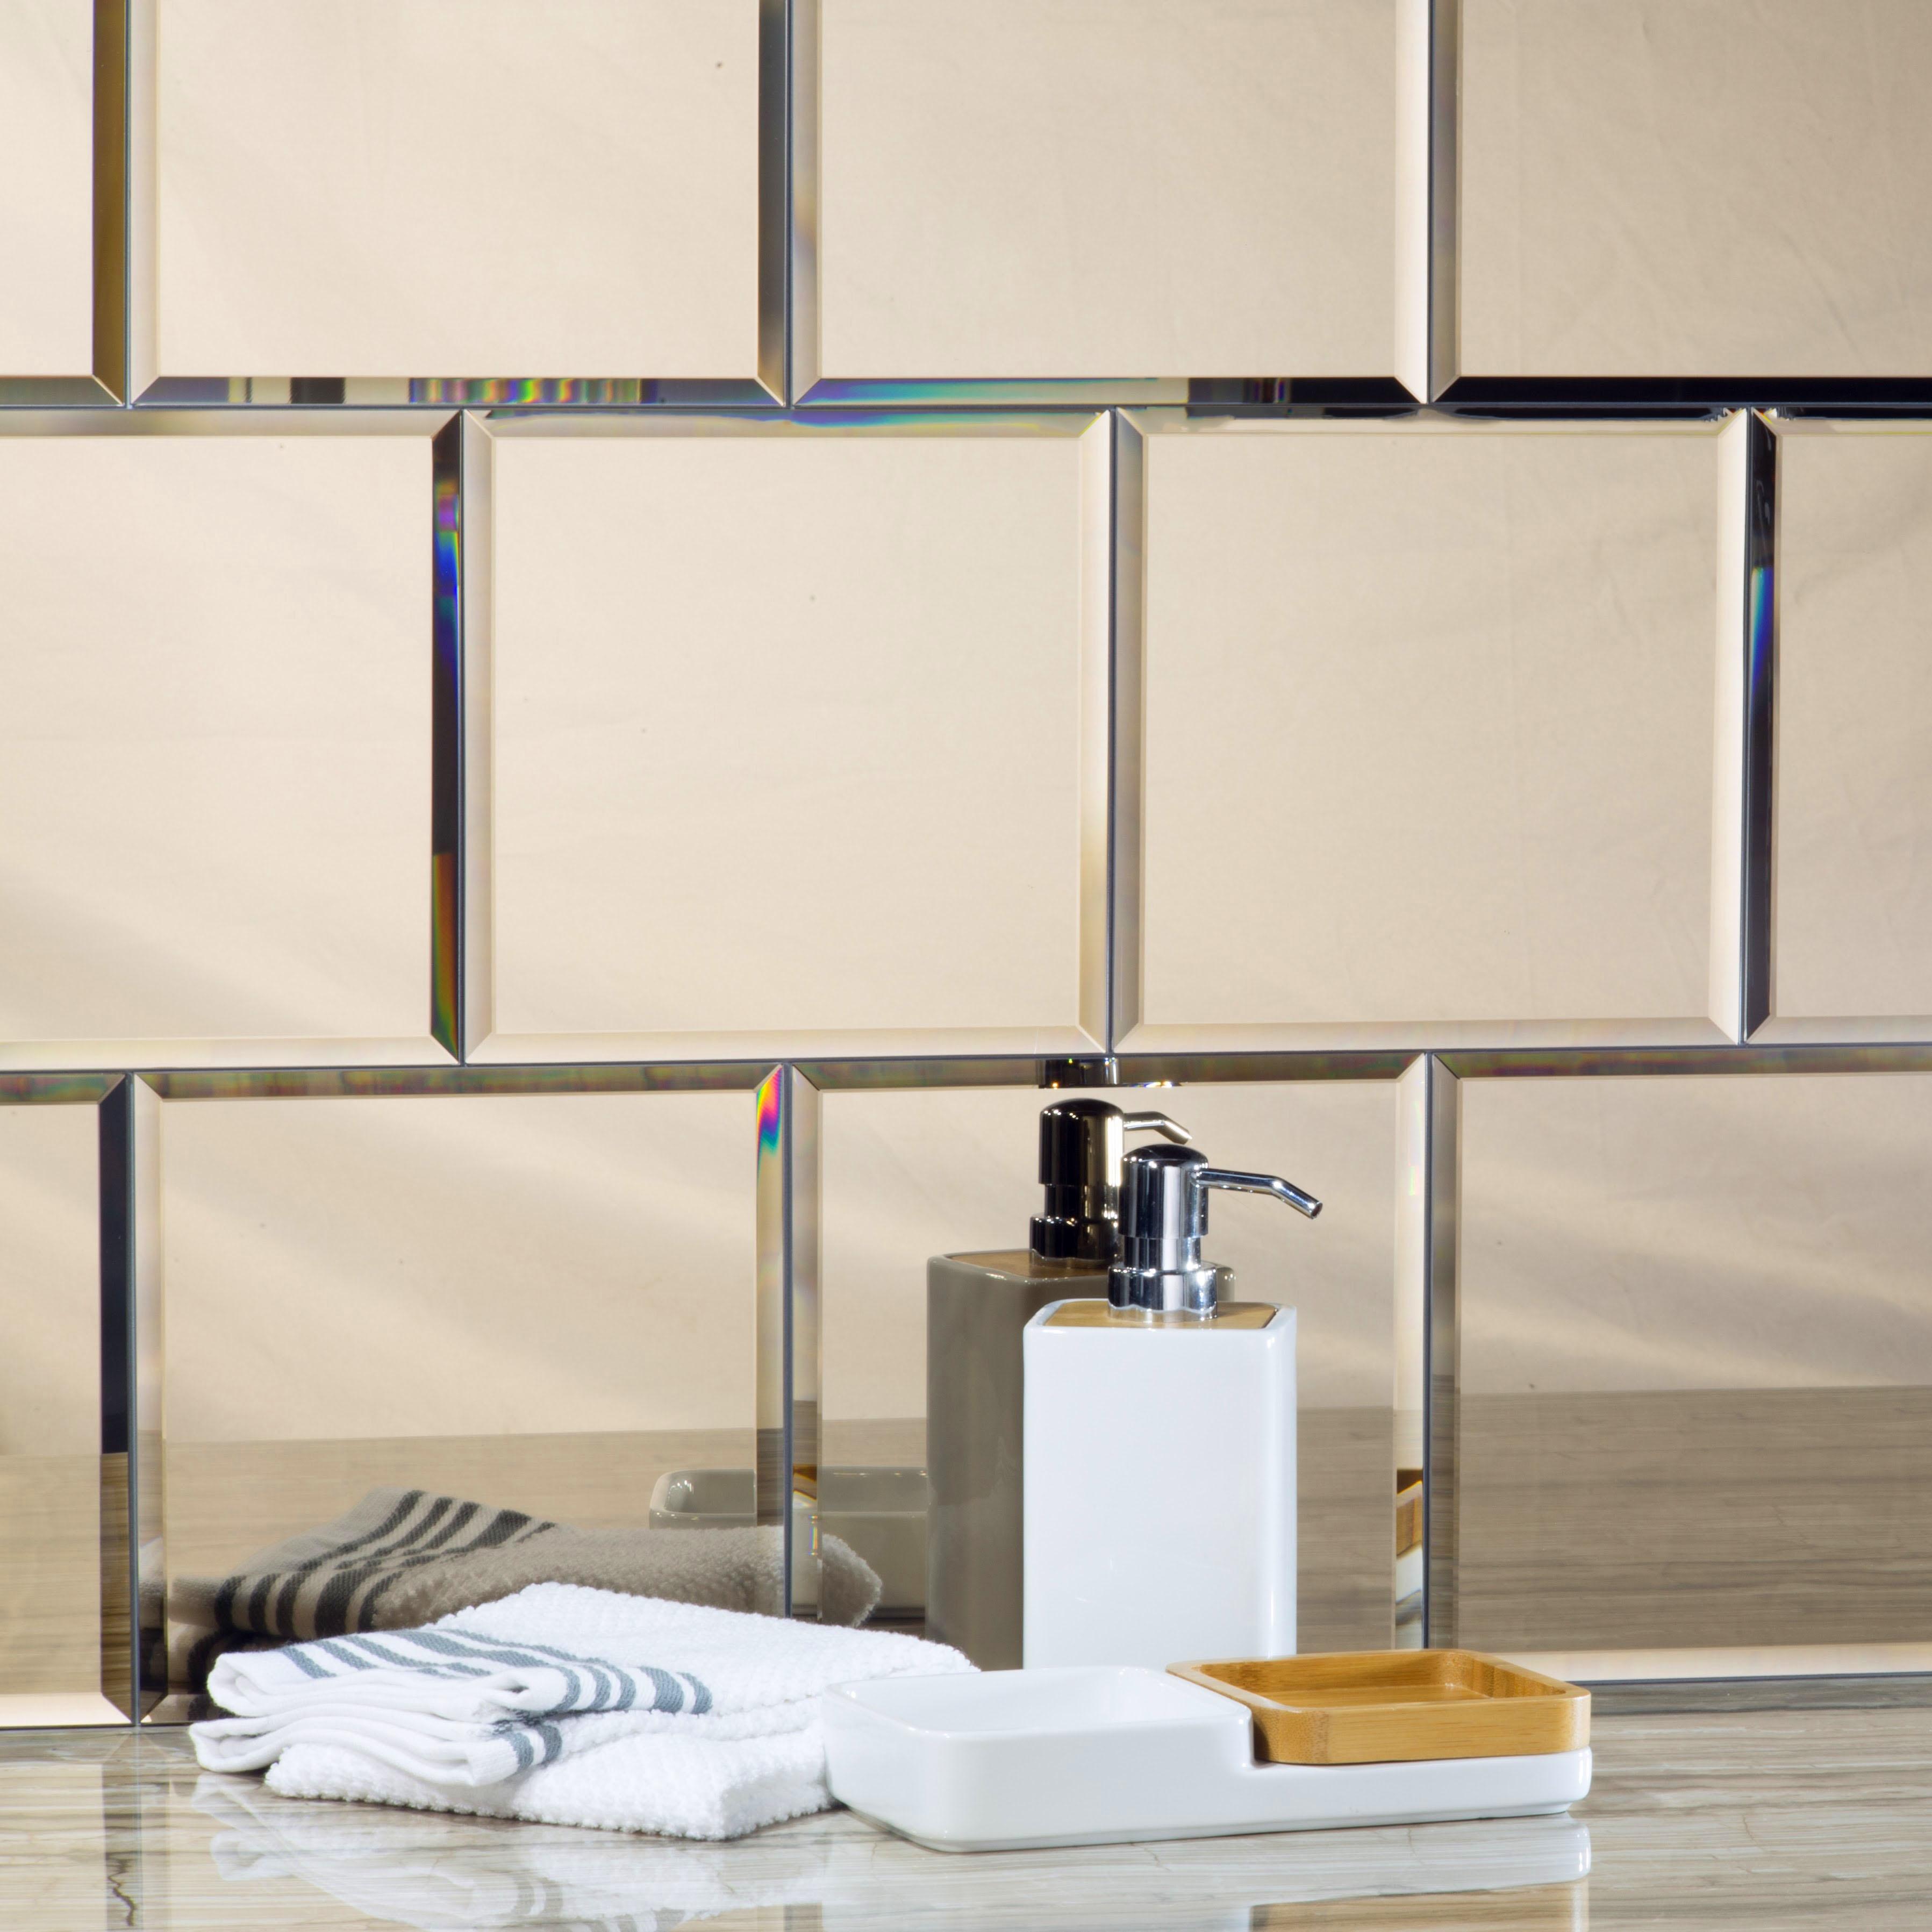 "Reflections 8"" x 8"" Glossy Gold Mirror Field Backsplash Wall Tile"